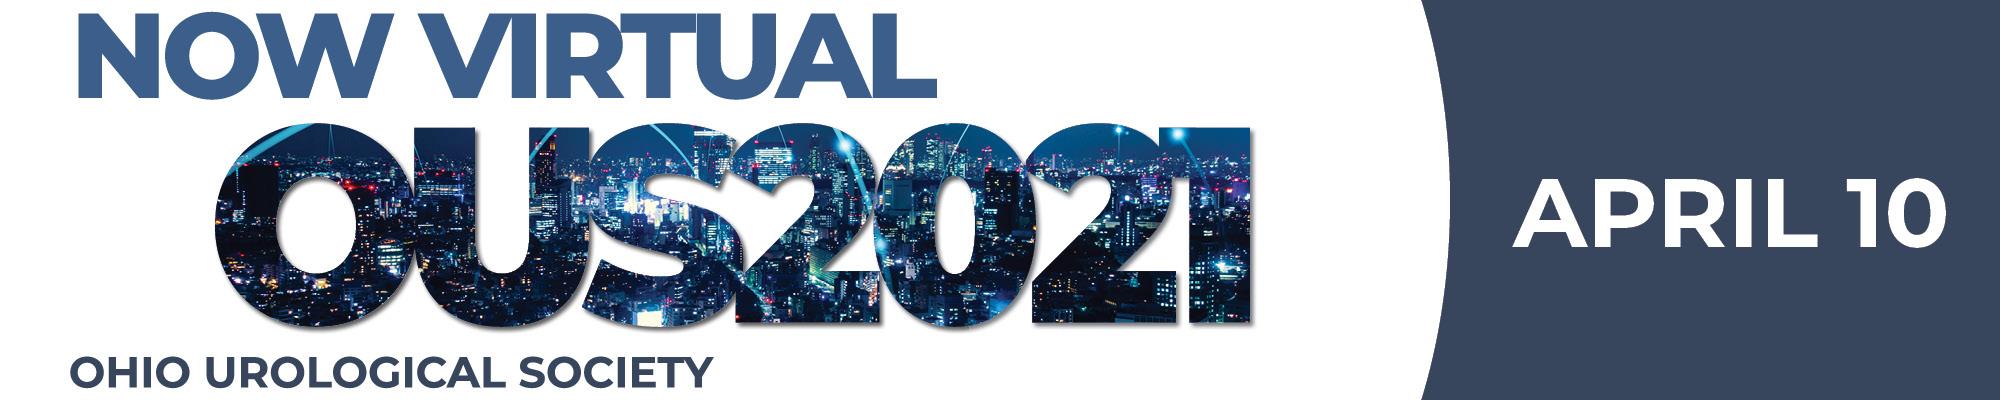 MSK-Course-2021-Banner